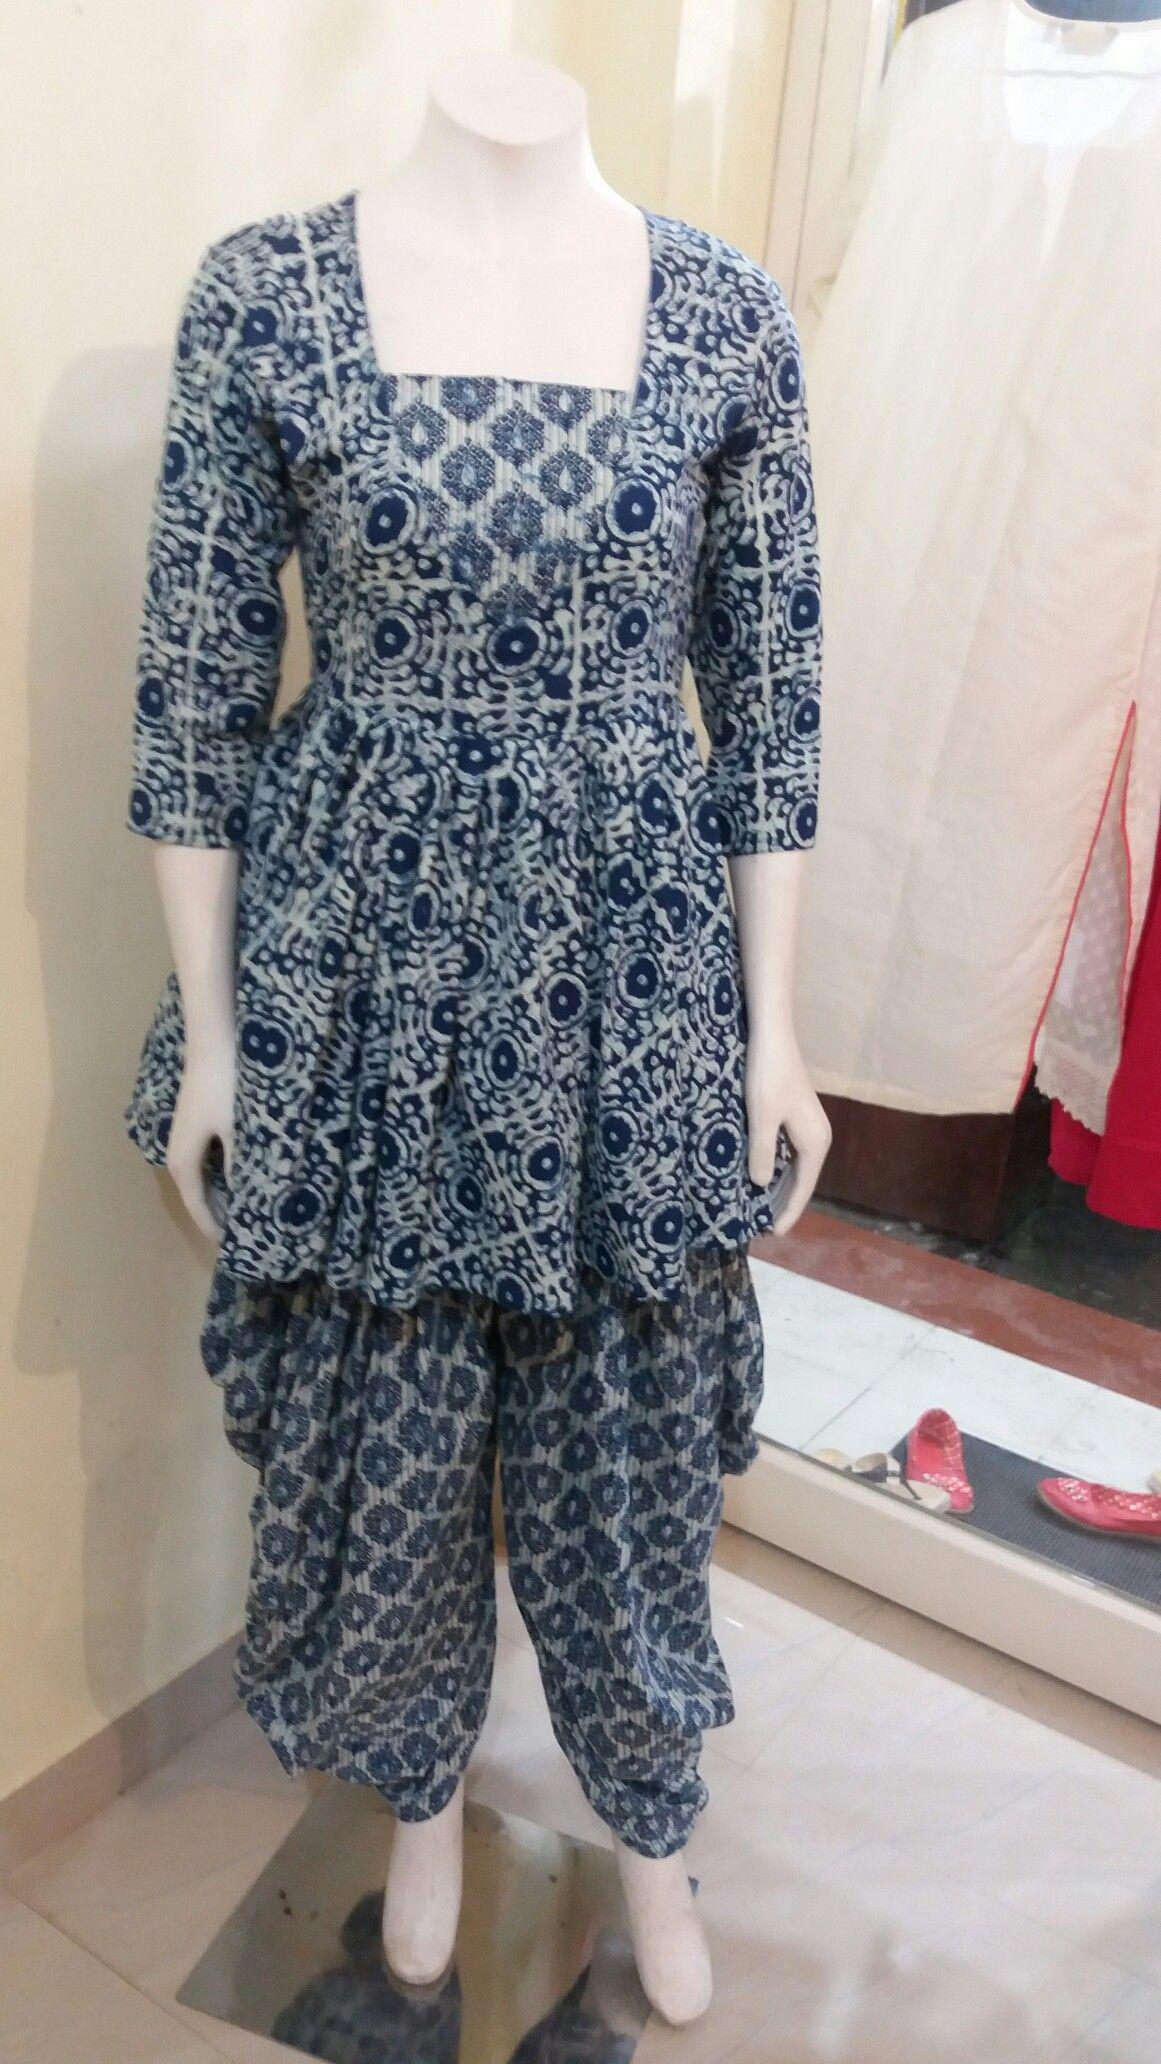 Pin By Yashfa Arshad On Fashion Blouse Design Models Girly